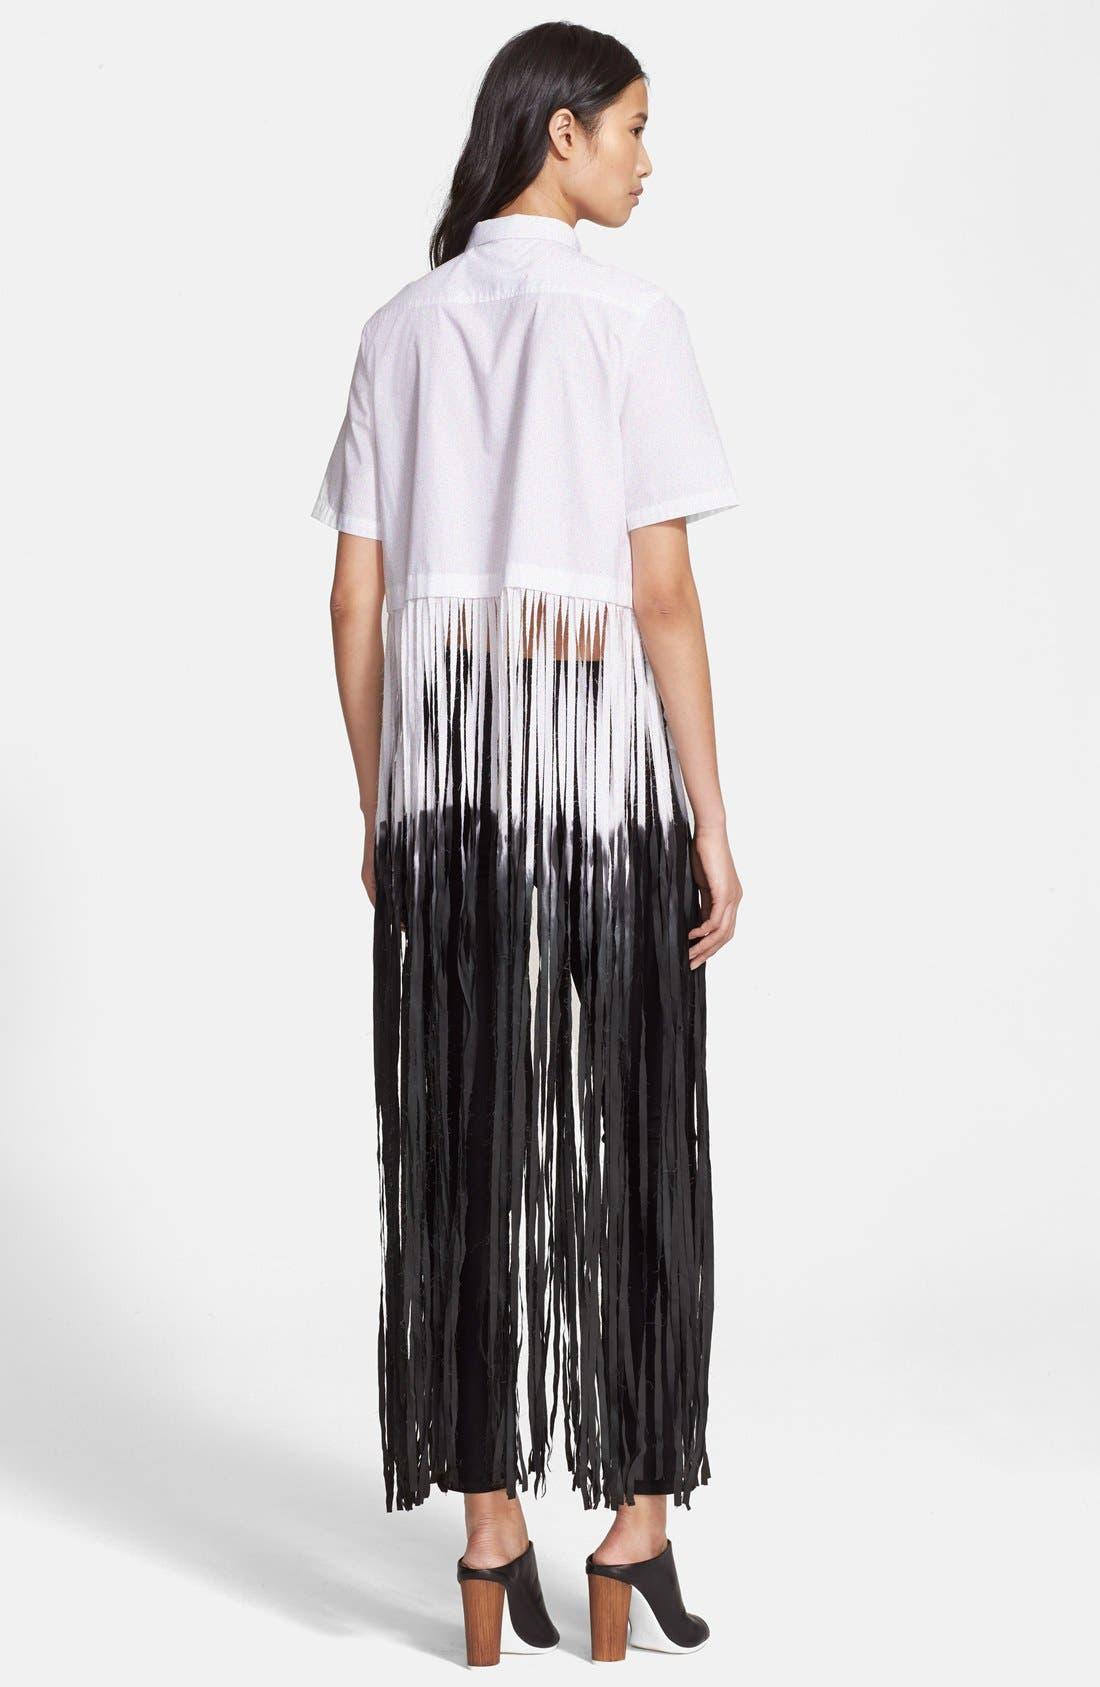 EACH X OTHER, Dip Dyed Long Fringe Cotton Poplin Shirt, Alternate thumbnail 2, color, 100